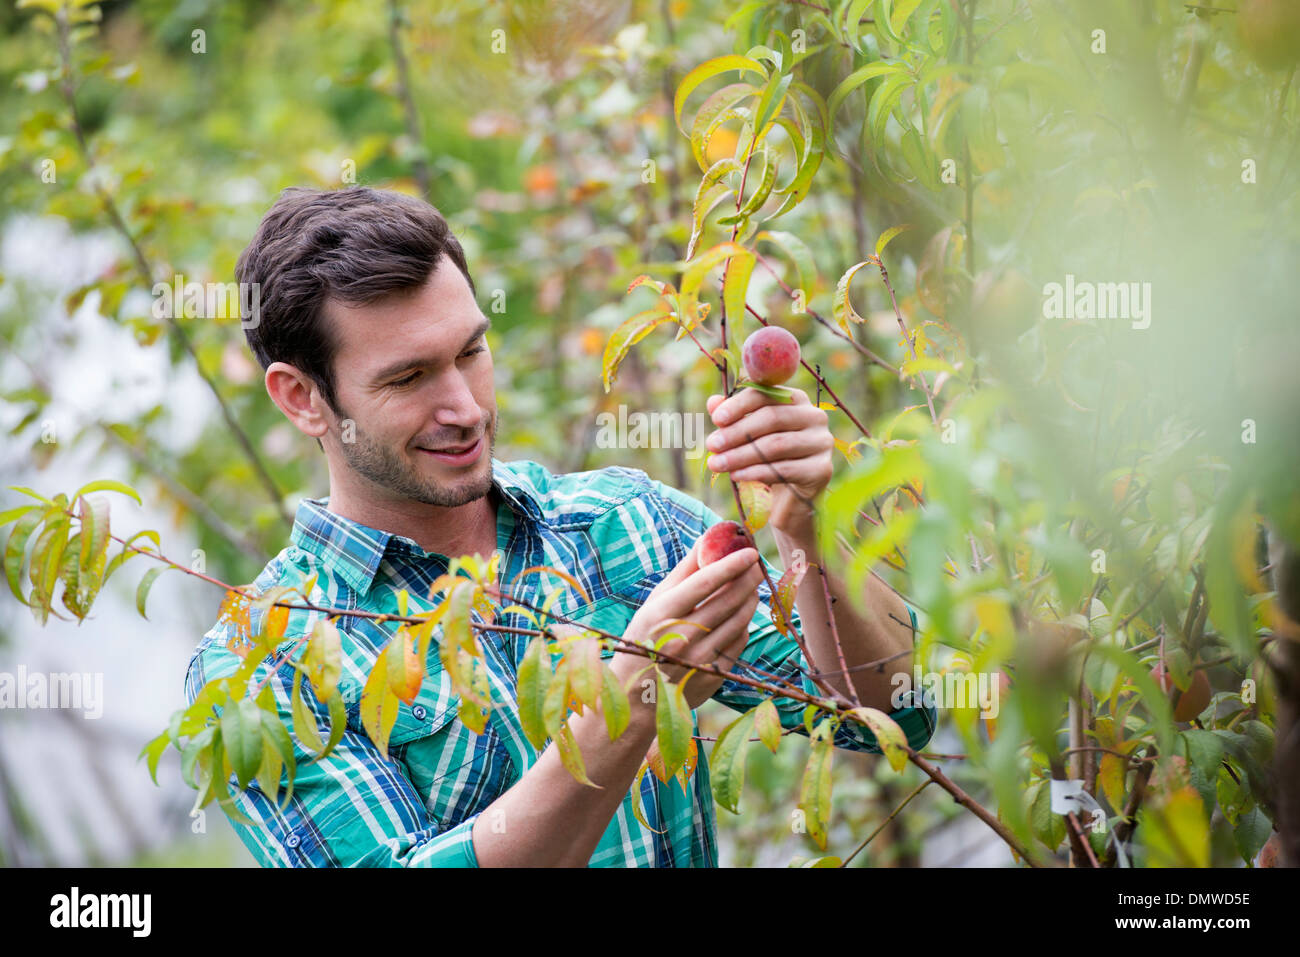 An organic flower plant nursery. A man working tending  plants. - Stock Image